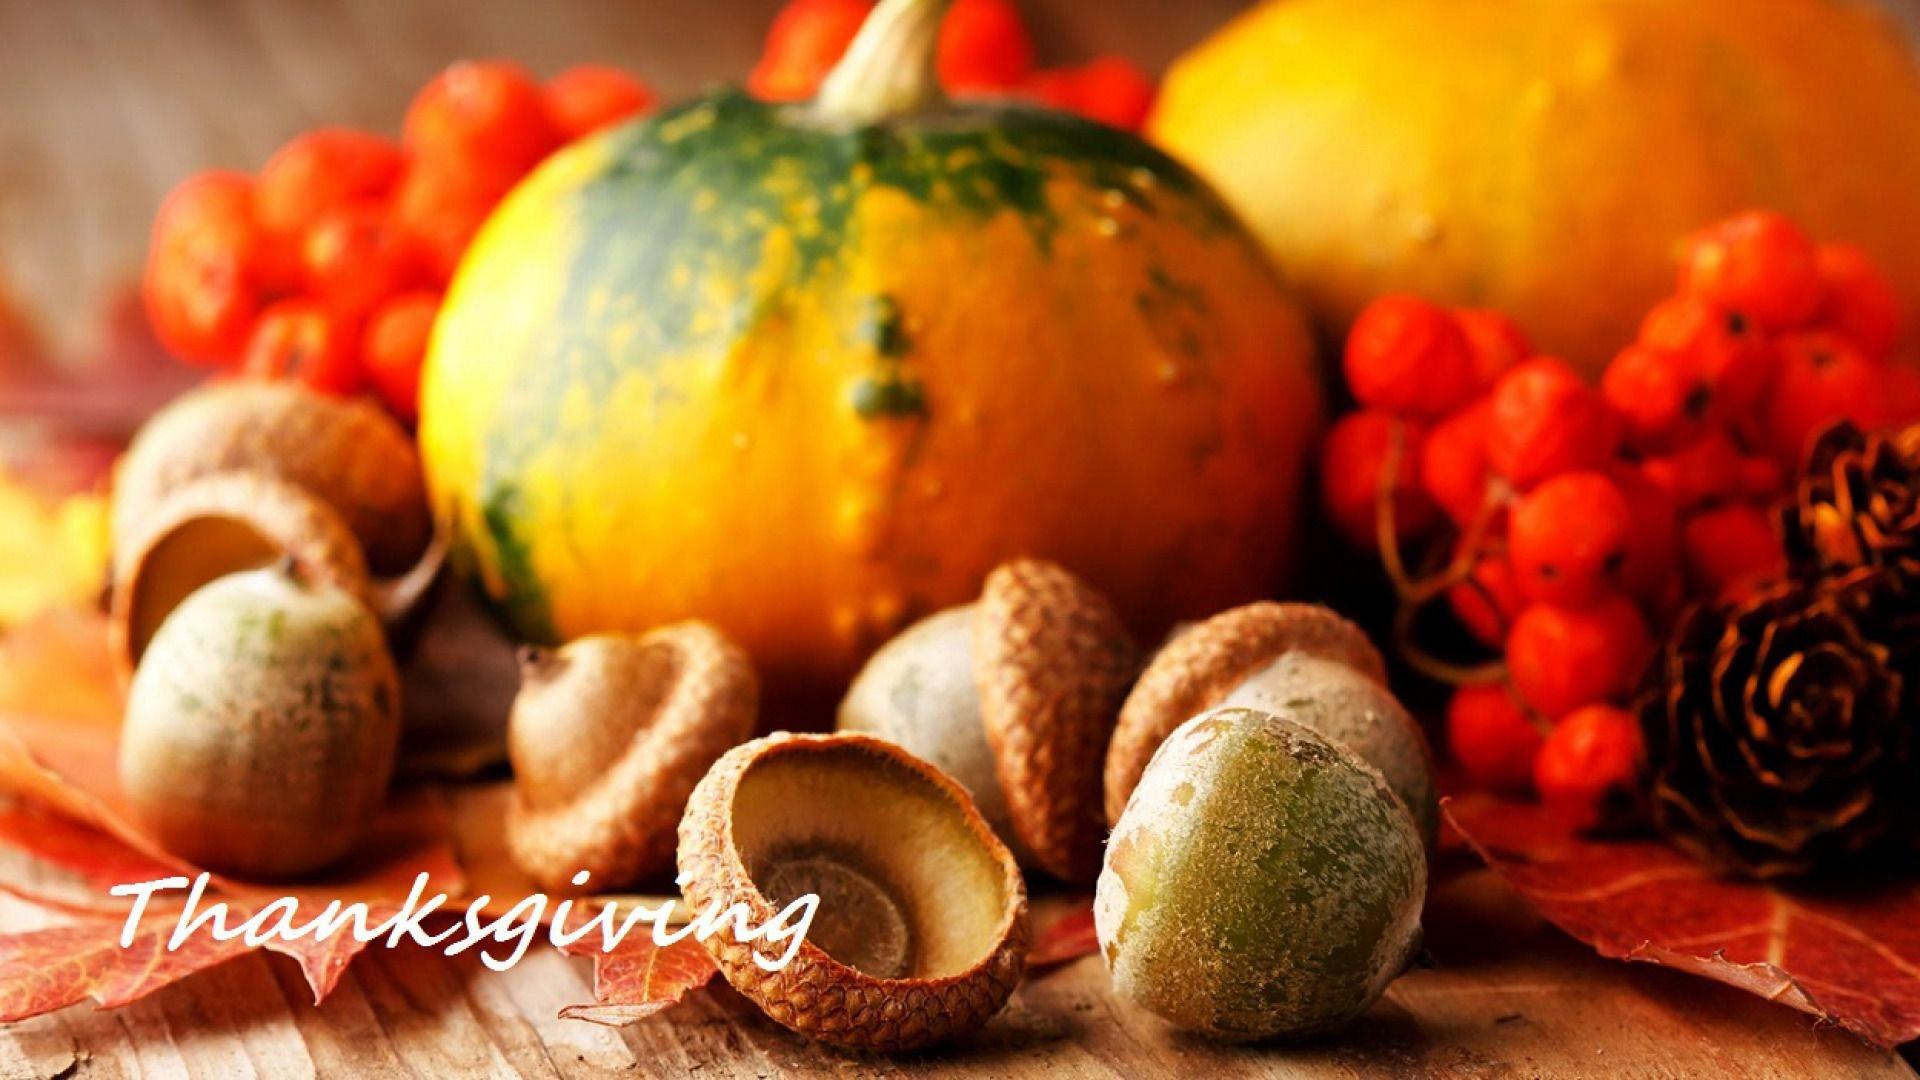 Data-src /w/full/7/e/7/132881 - Thanksgiving Desktop Backgrounds - HD Wallpaper